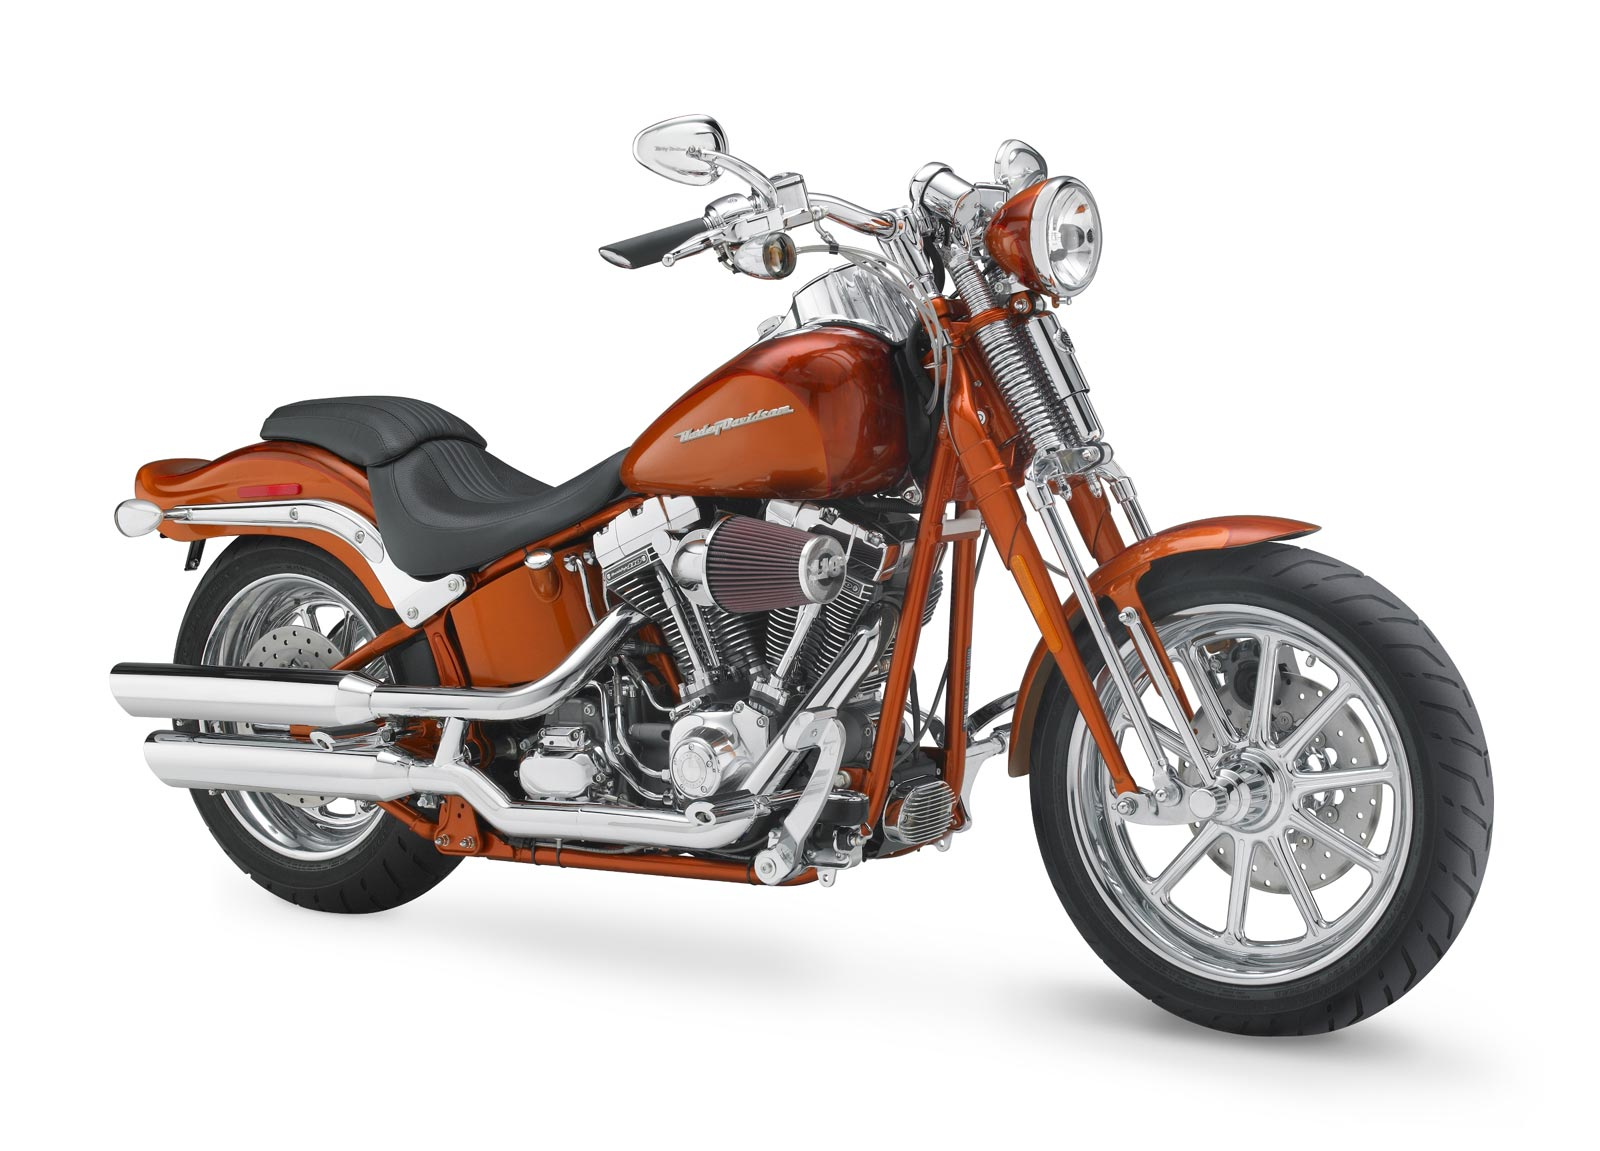 Harley Davidson Cvo Softail Springer Specs